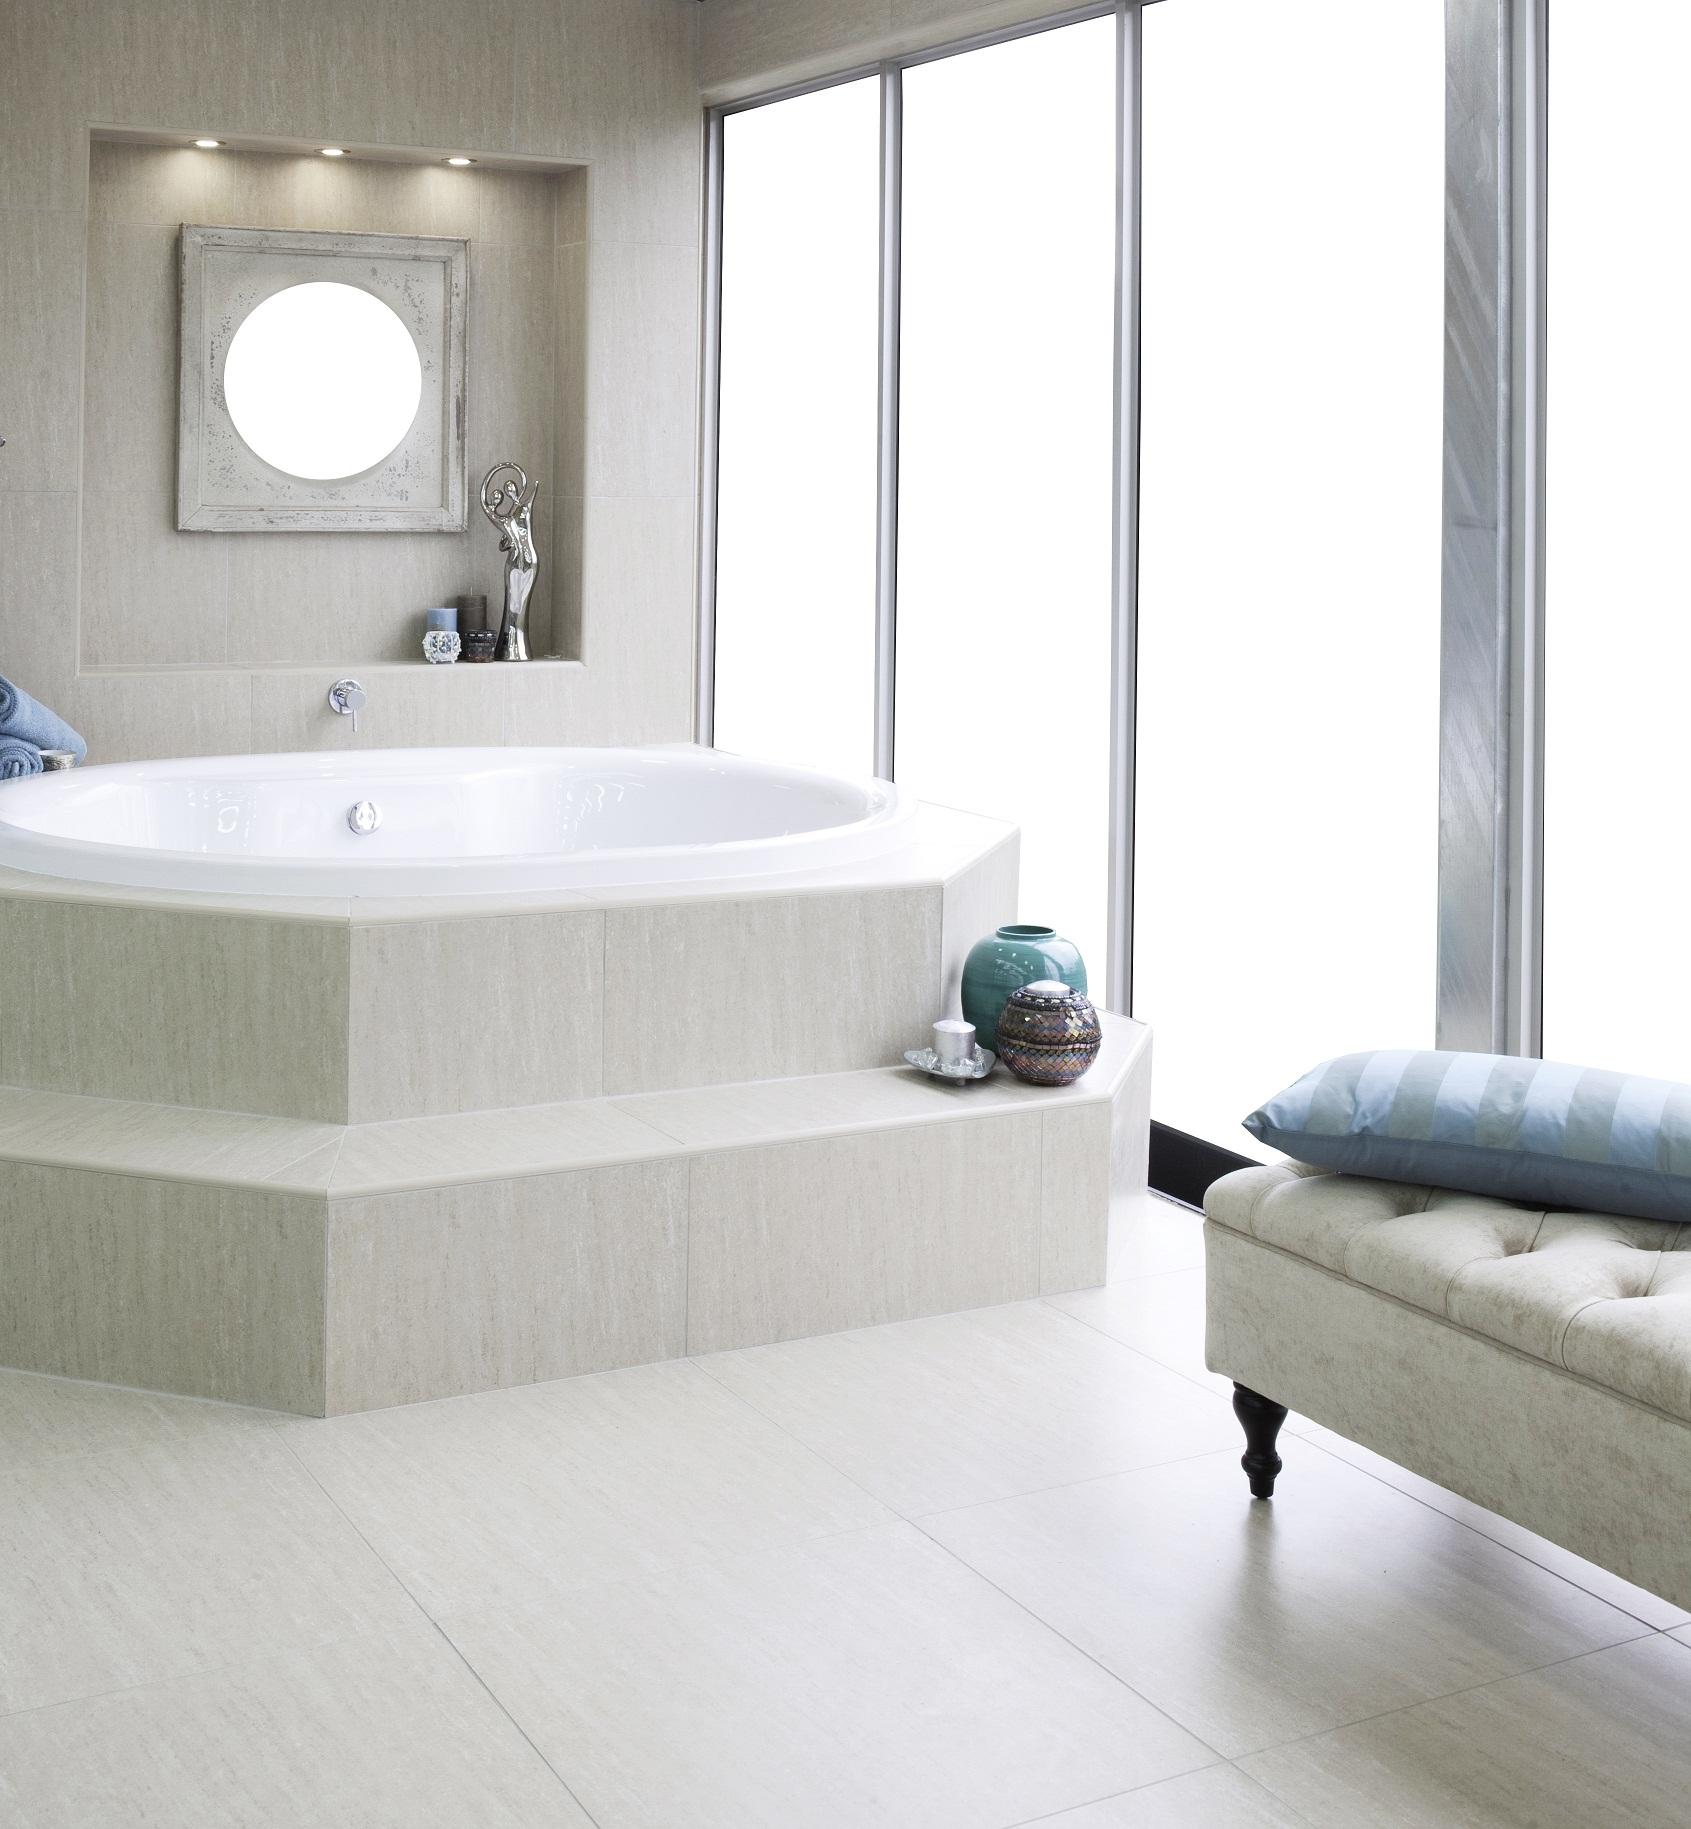 Top bathroom trends for 2012 for Popular bathroom trends